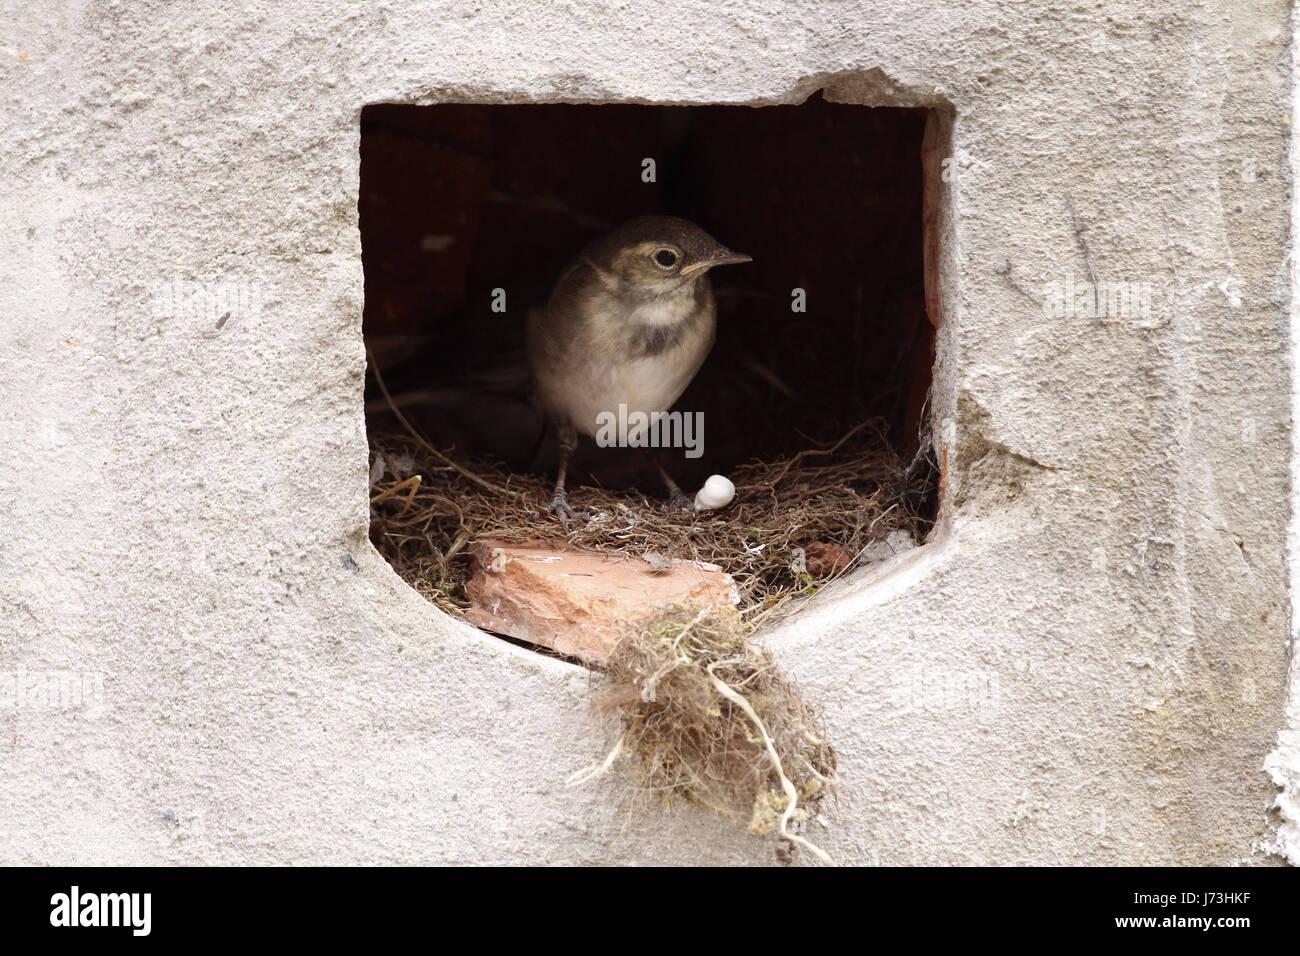 Aves anidan aves cantando-bird bobolinks wagtail zancudos aves anidan aves feed Foto de stock